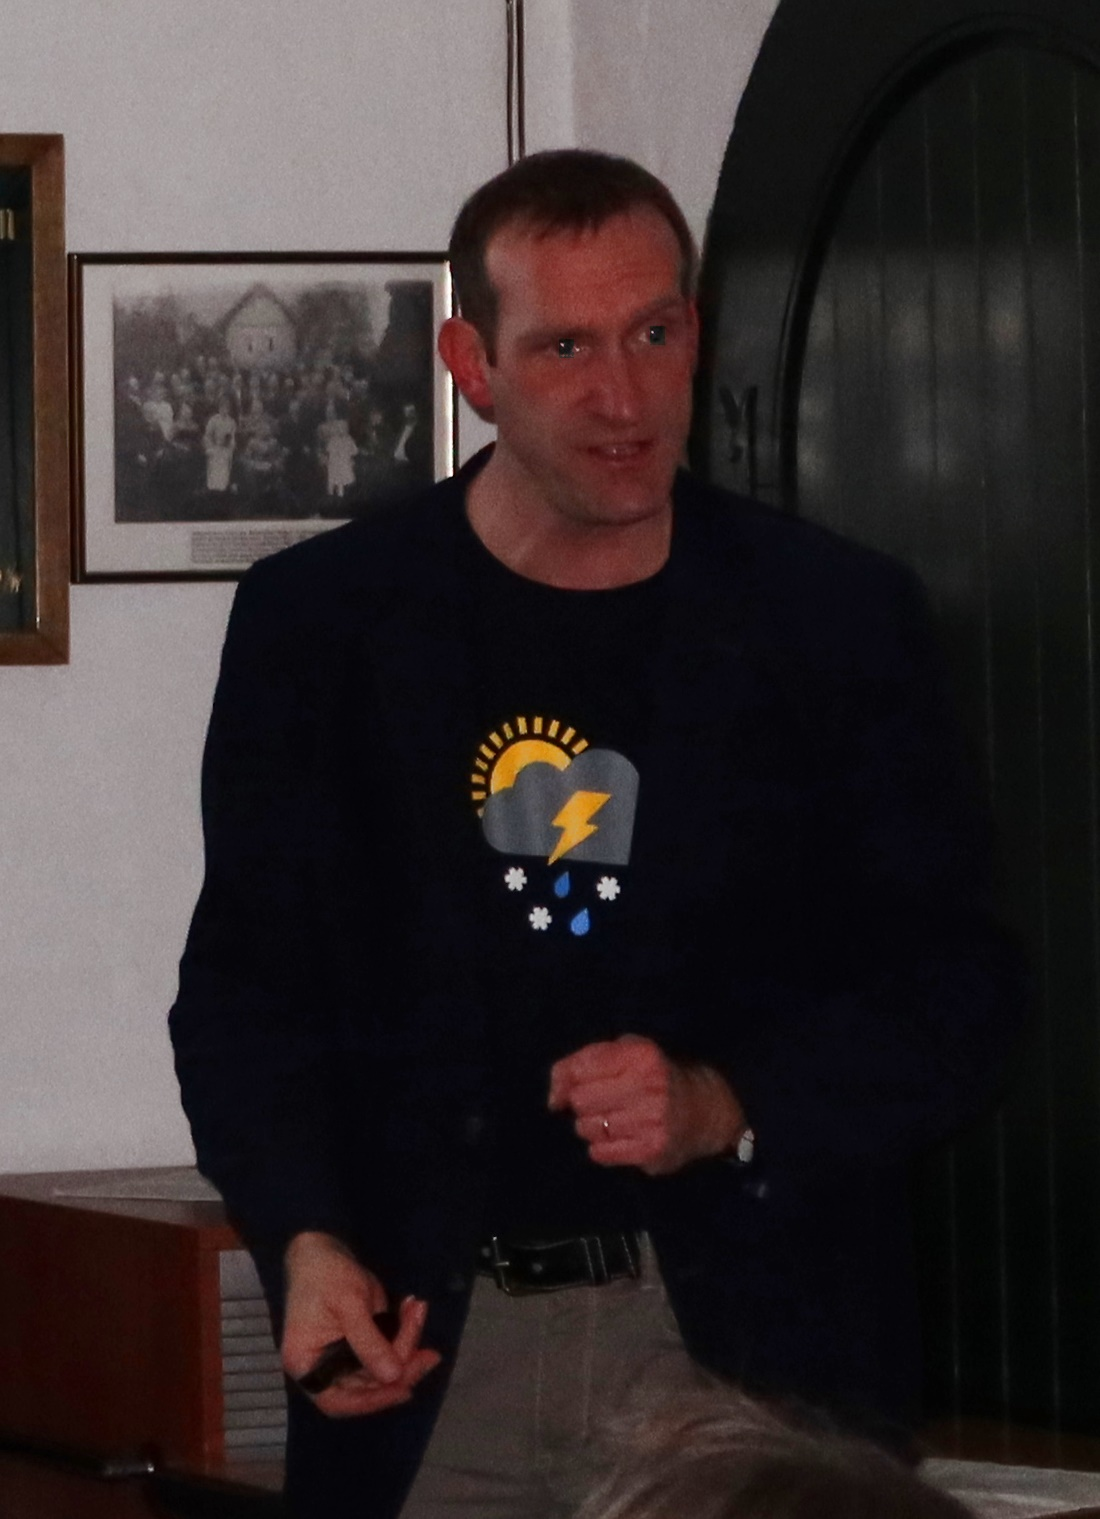 Dipl.-Meteorologe Friedrich Föst am 15. März